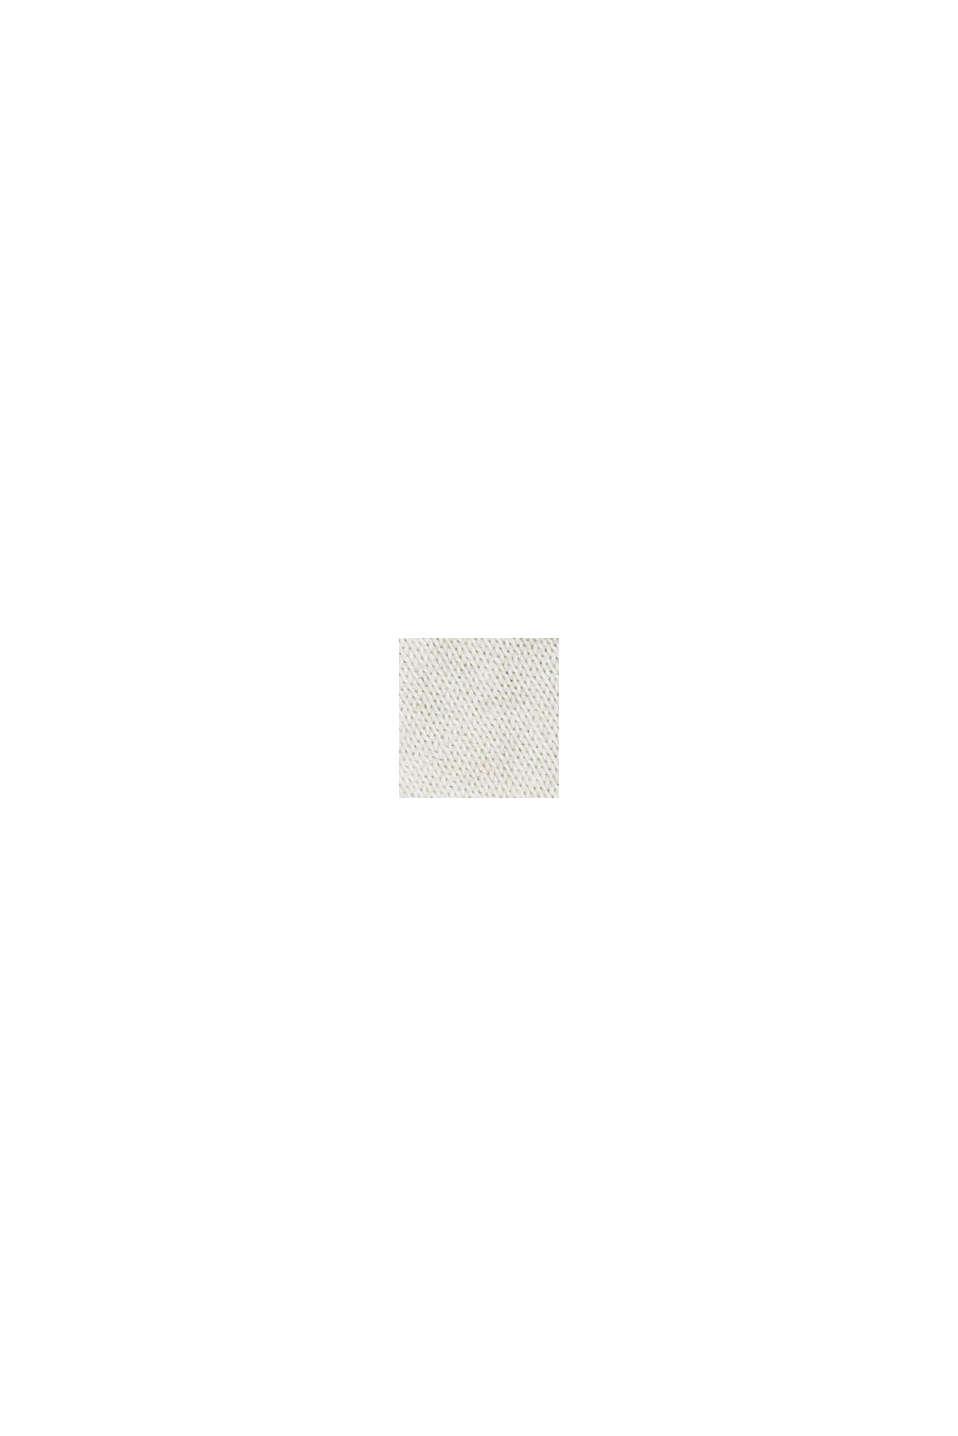 Jersey en 100% algodón ecológico, OFF WHITE, swatch